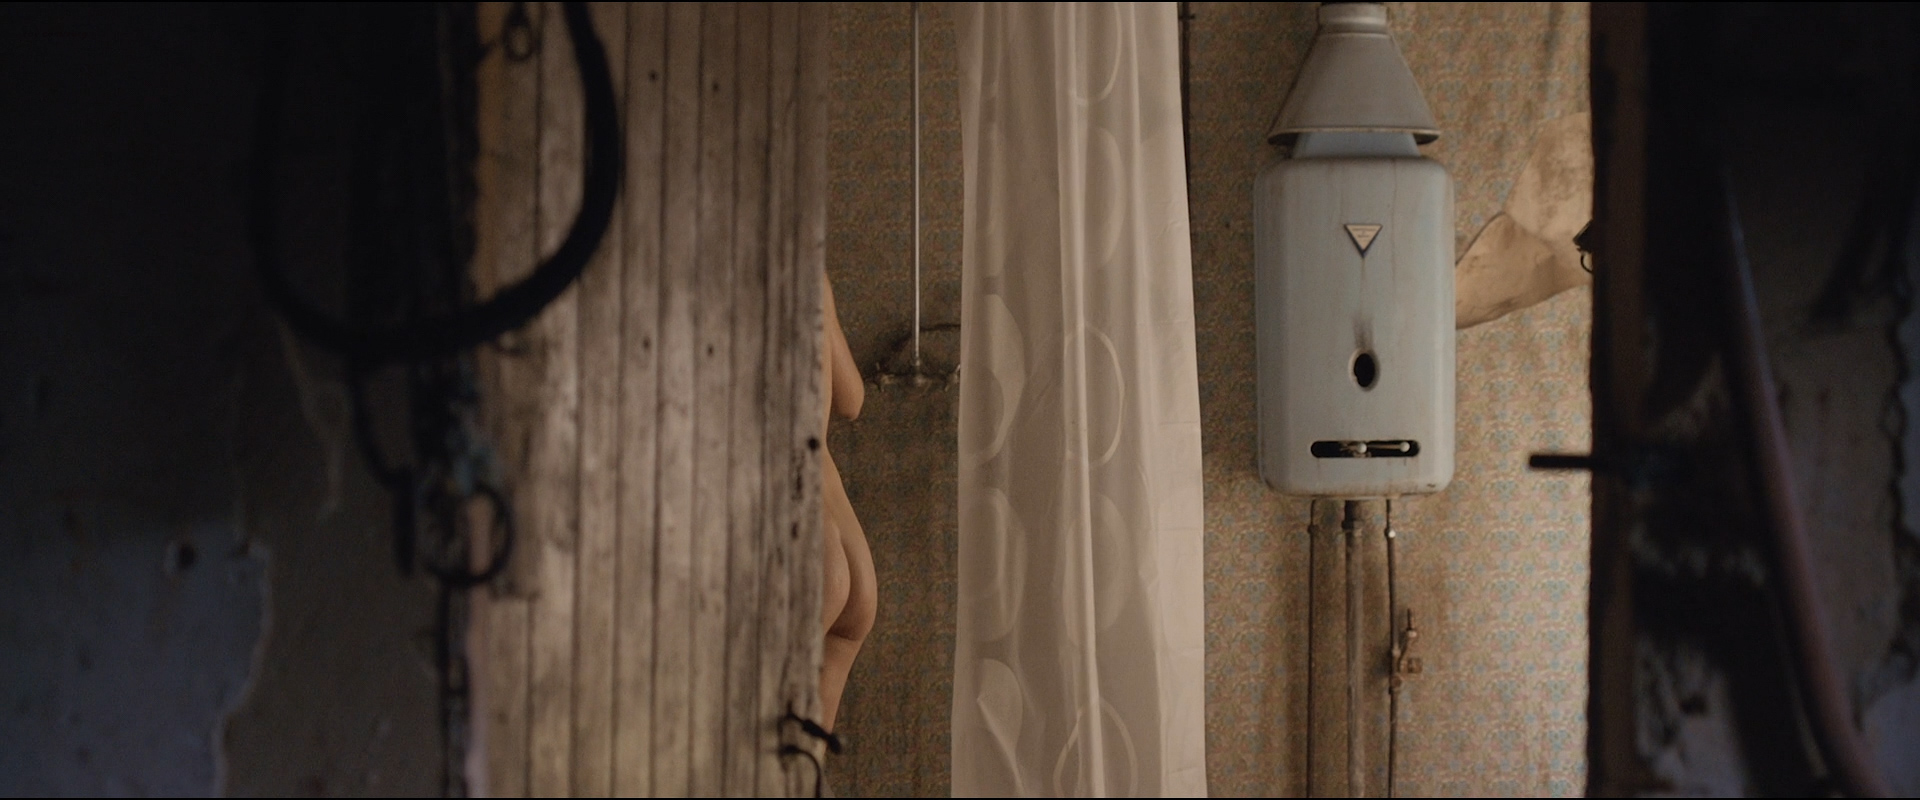 Loes Haverkort nude hot sex - Rendez-Vous (NL-2015) HD 1080p BluRay (1)